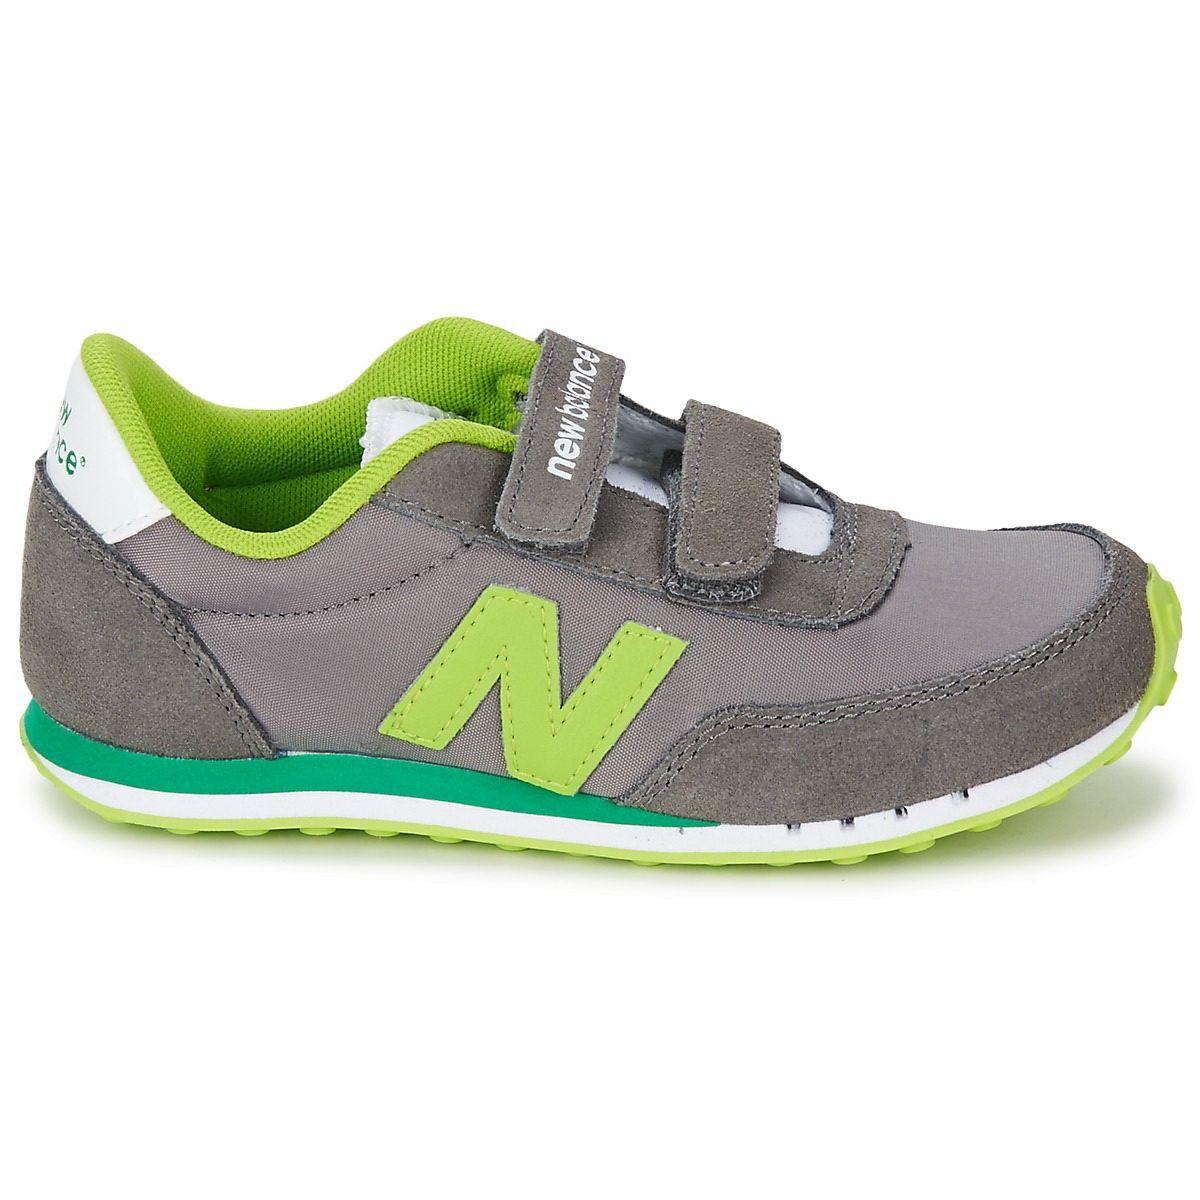 aab29128 Cheap New Balance Ke410 Grey Green For Kid #NewBalance #NB998 ...